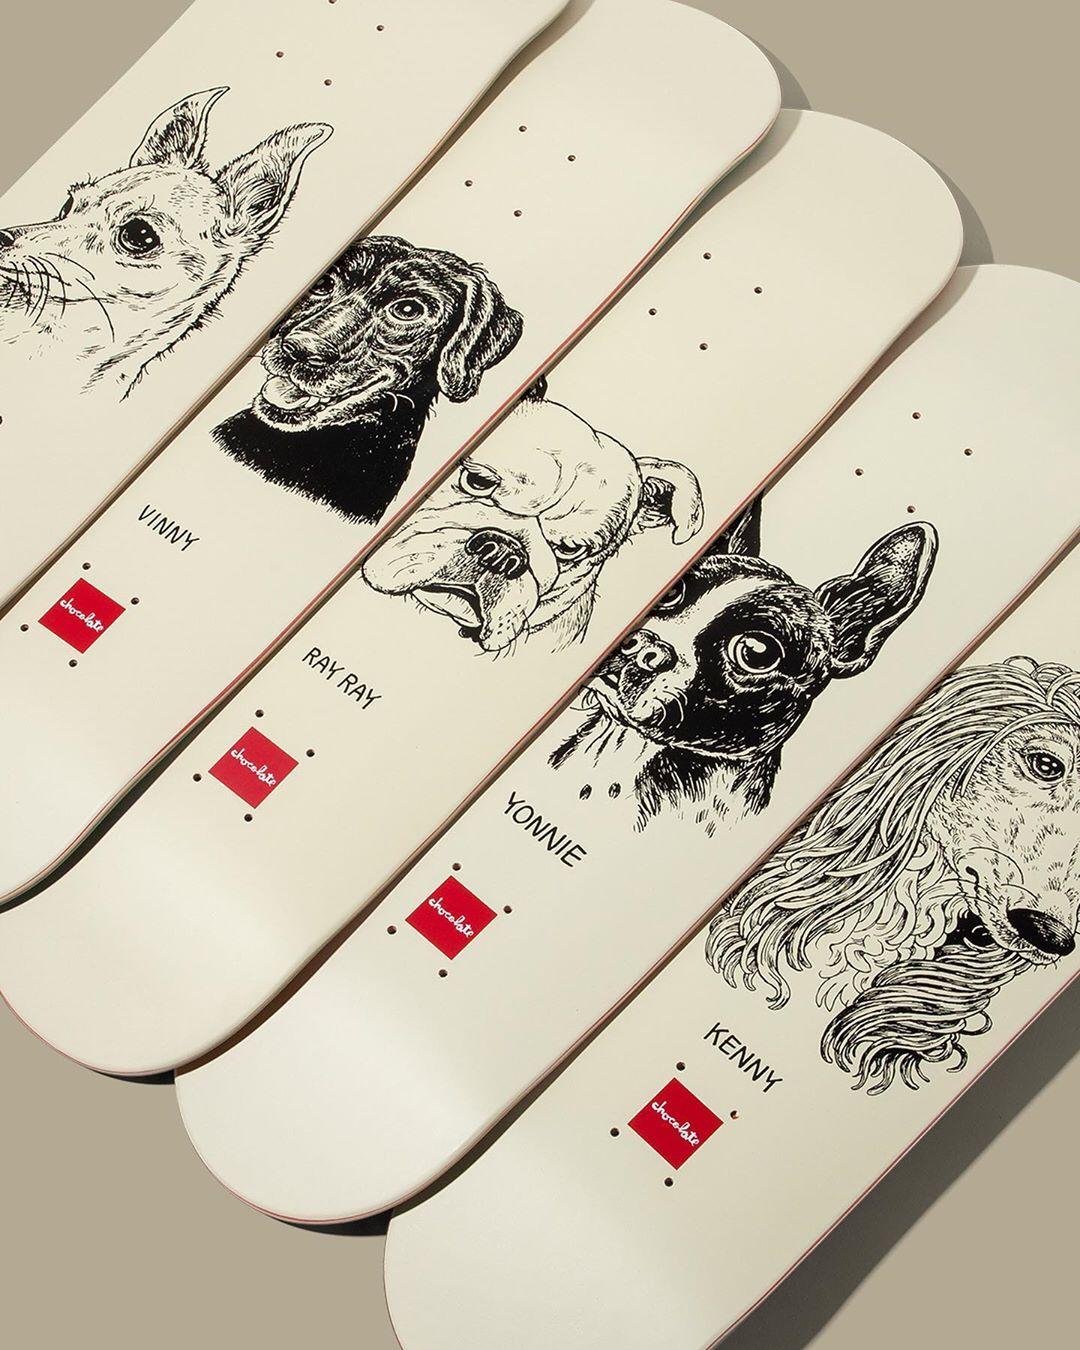 Big Dawgs Series By Travis Millard X Chocolate Skateboards 1.jpg